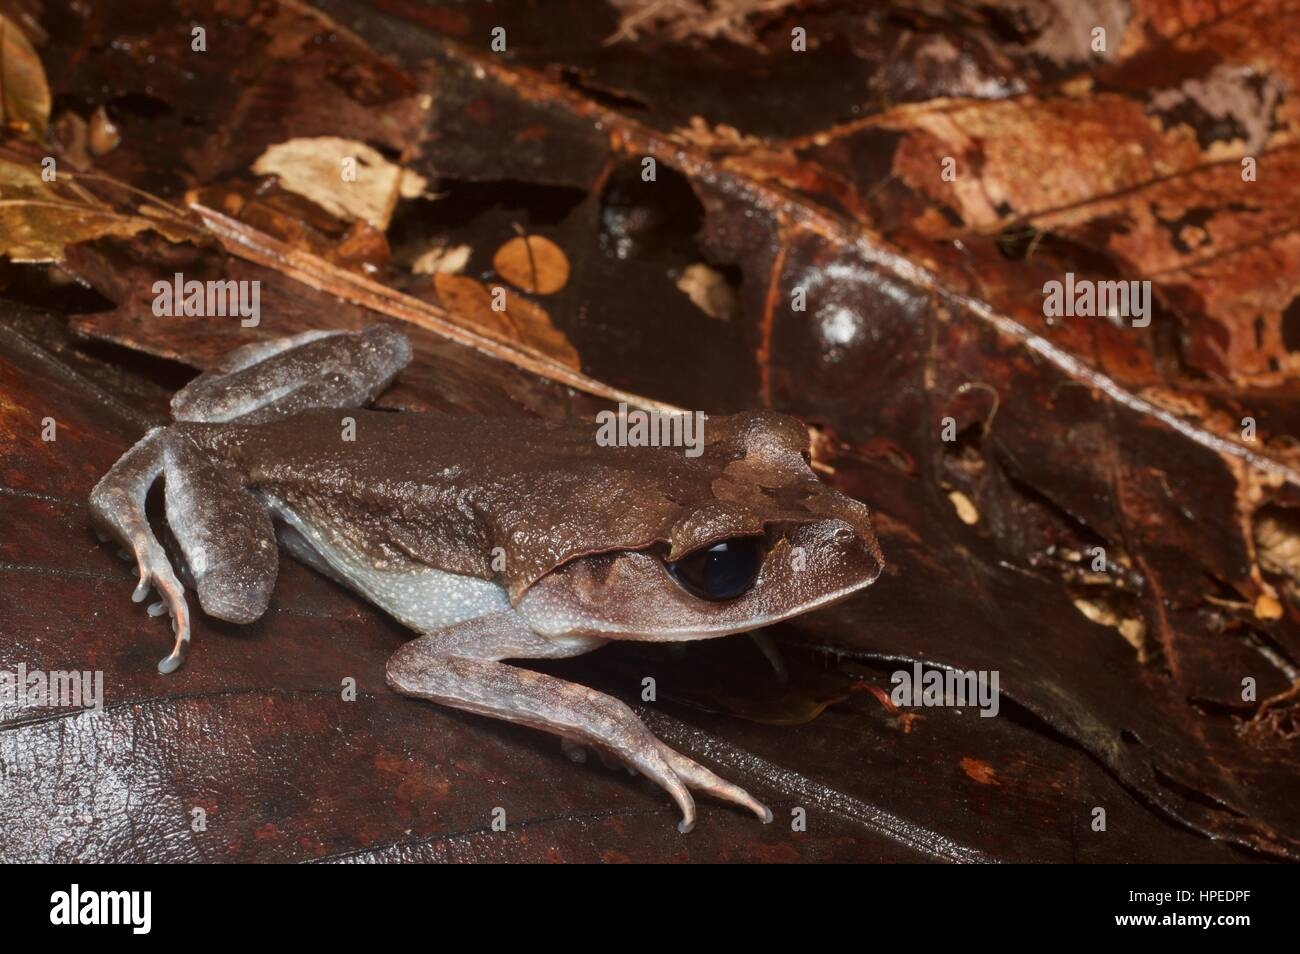 A Lowland Litter Frog (Leptobrachium abbotti) hunkered down at Kubah National Park, Sarawak, East Malaysia, Borneo - Stock Image